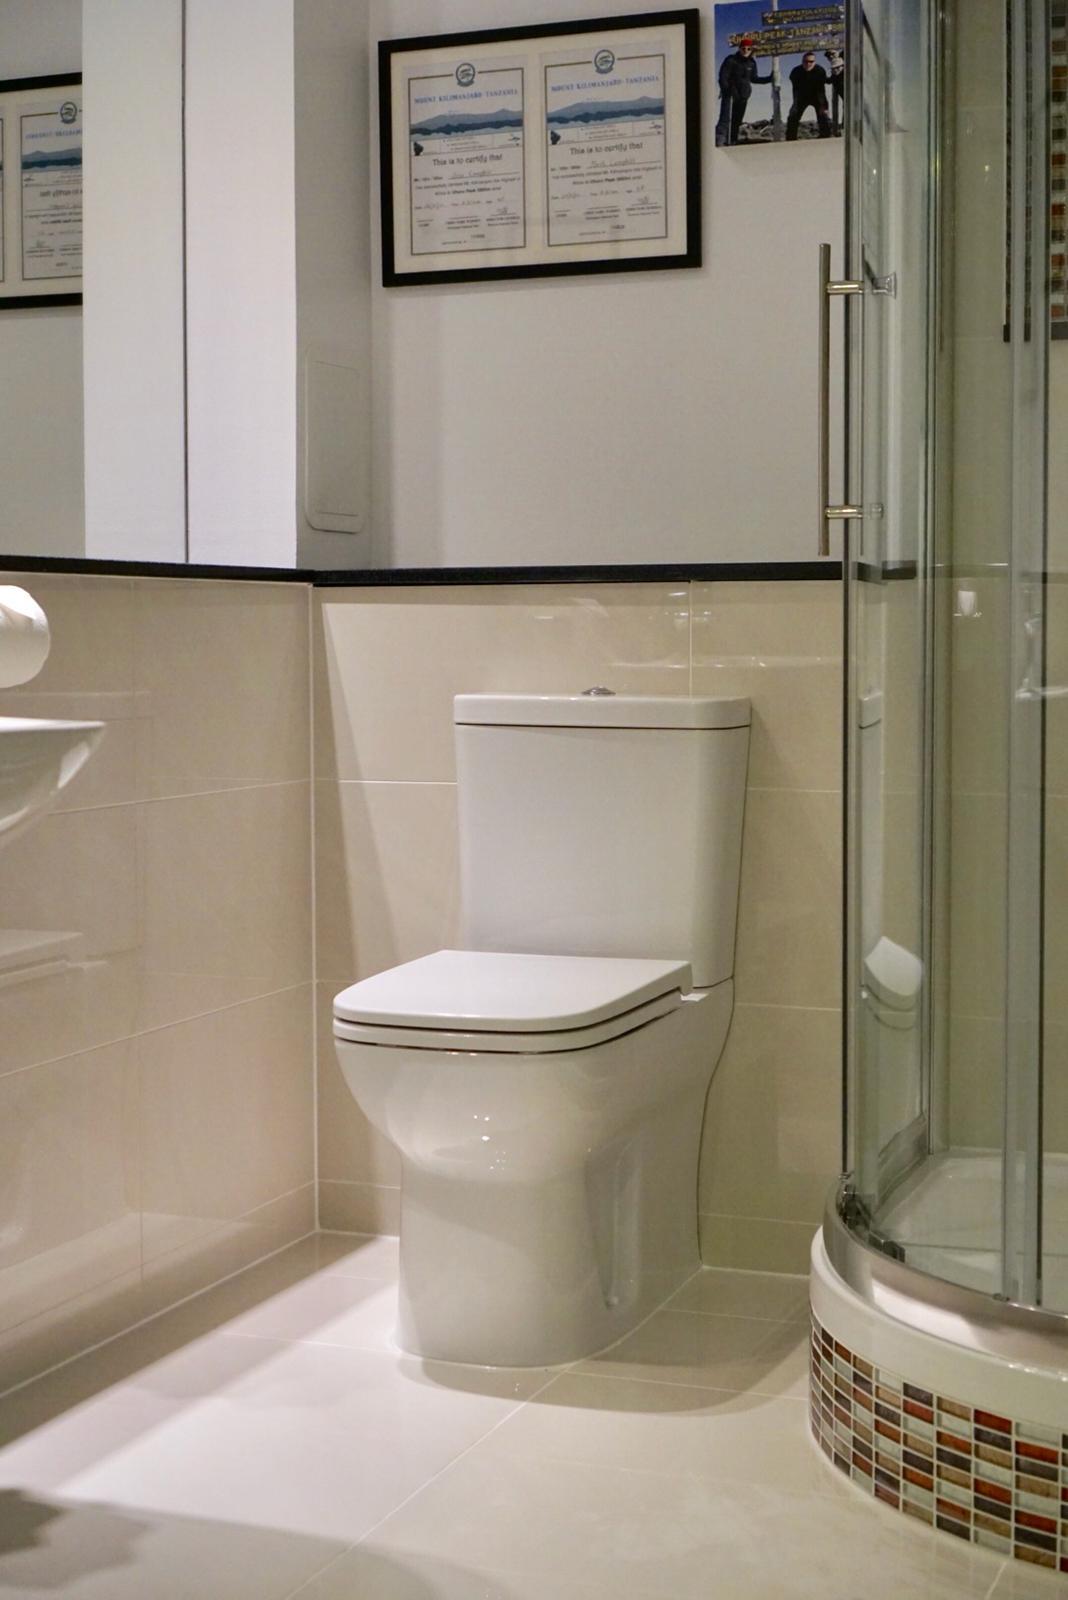 Bathroom Suites In Edinburgh Livingston And Lothians Jbc